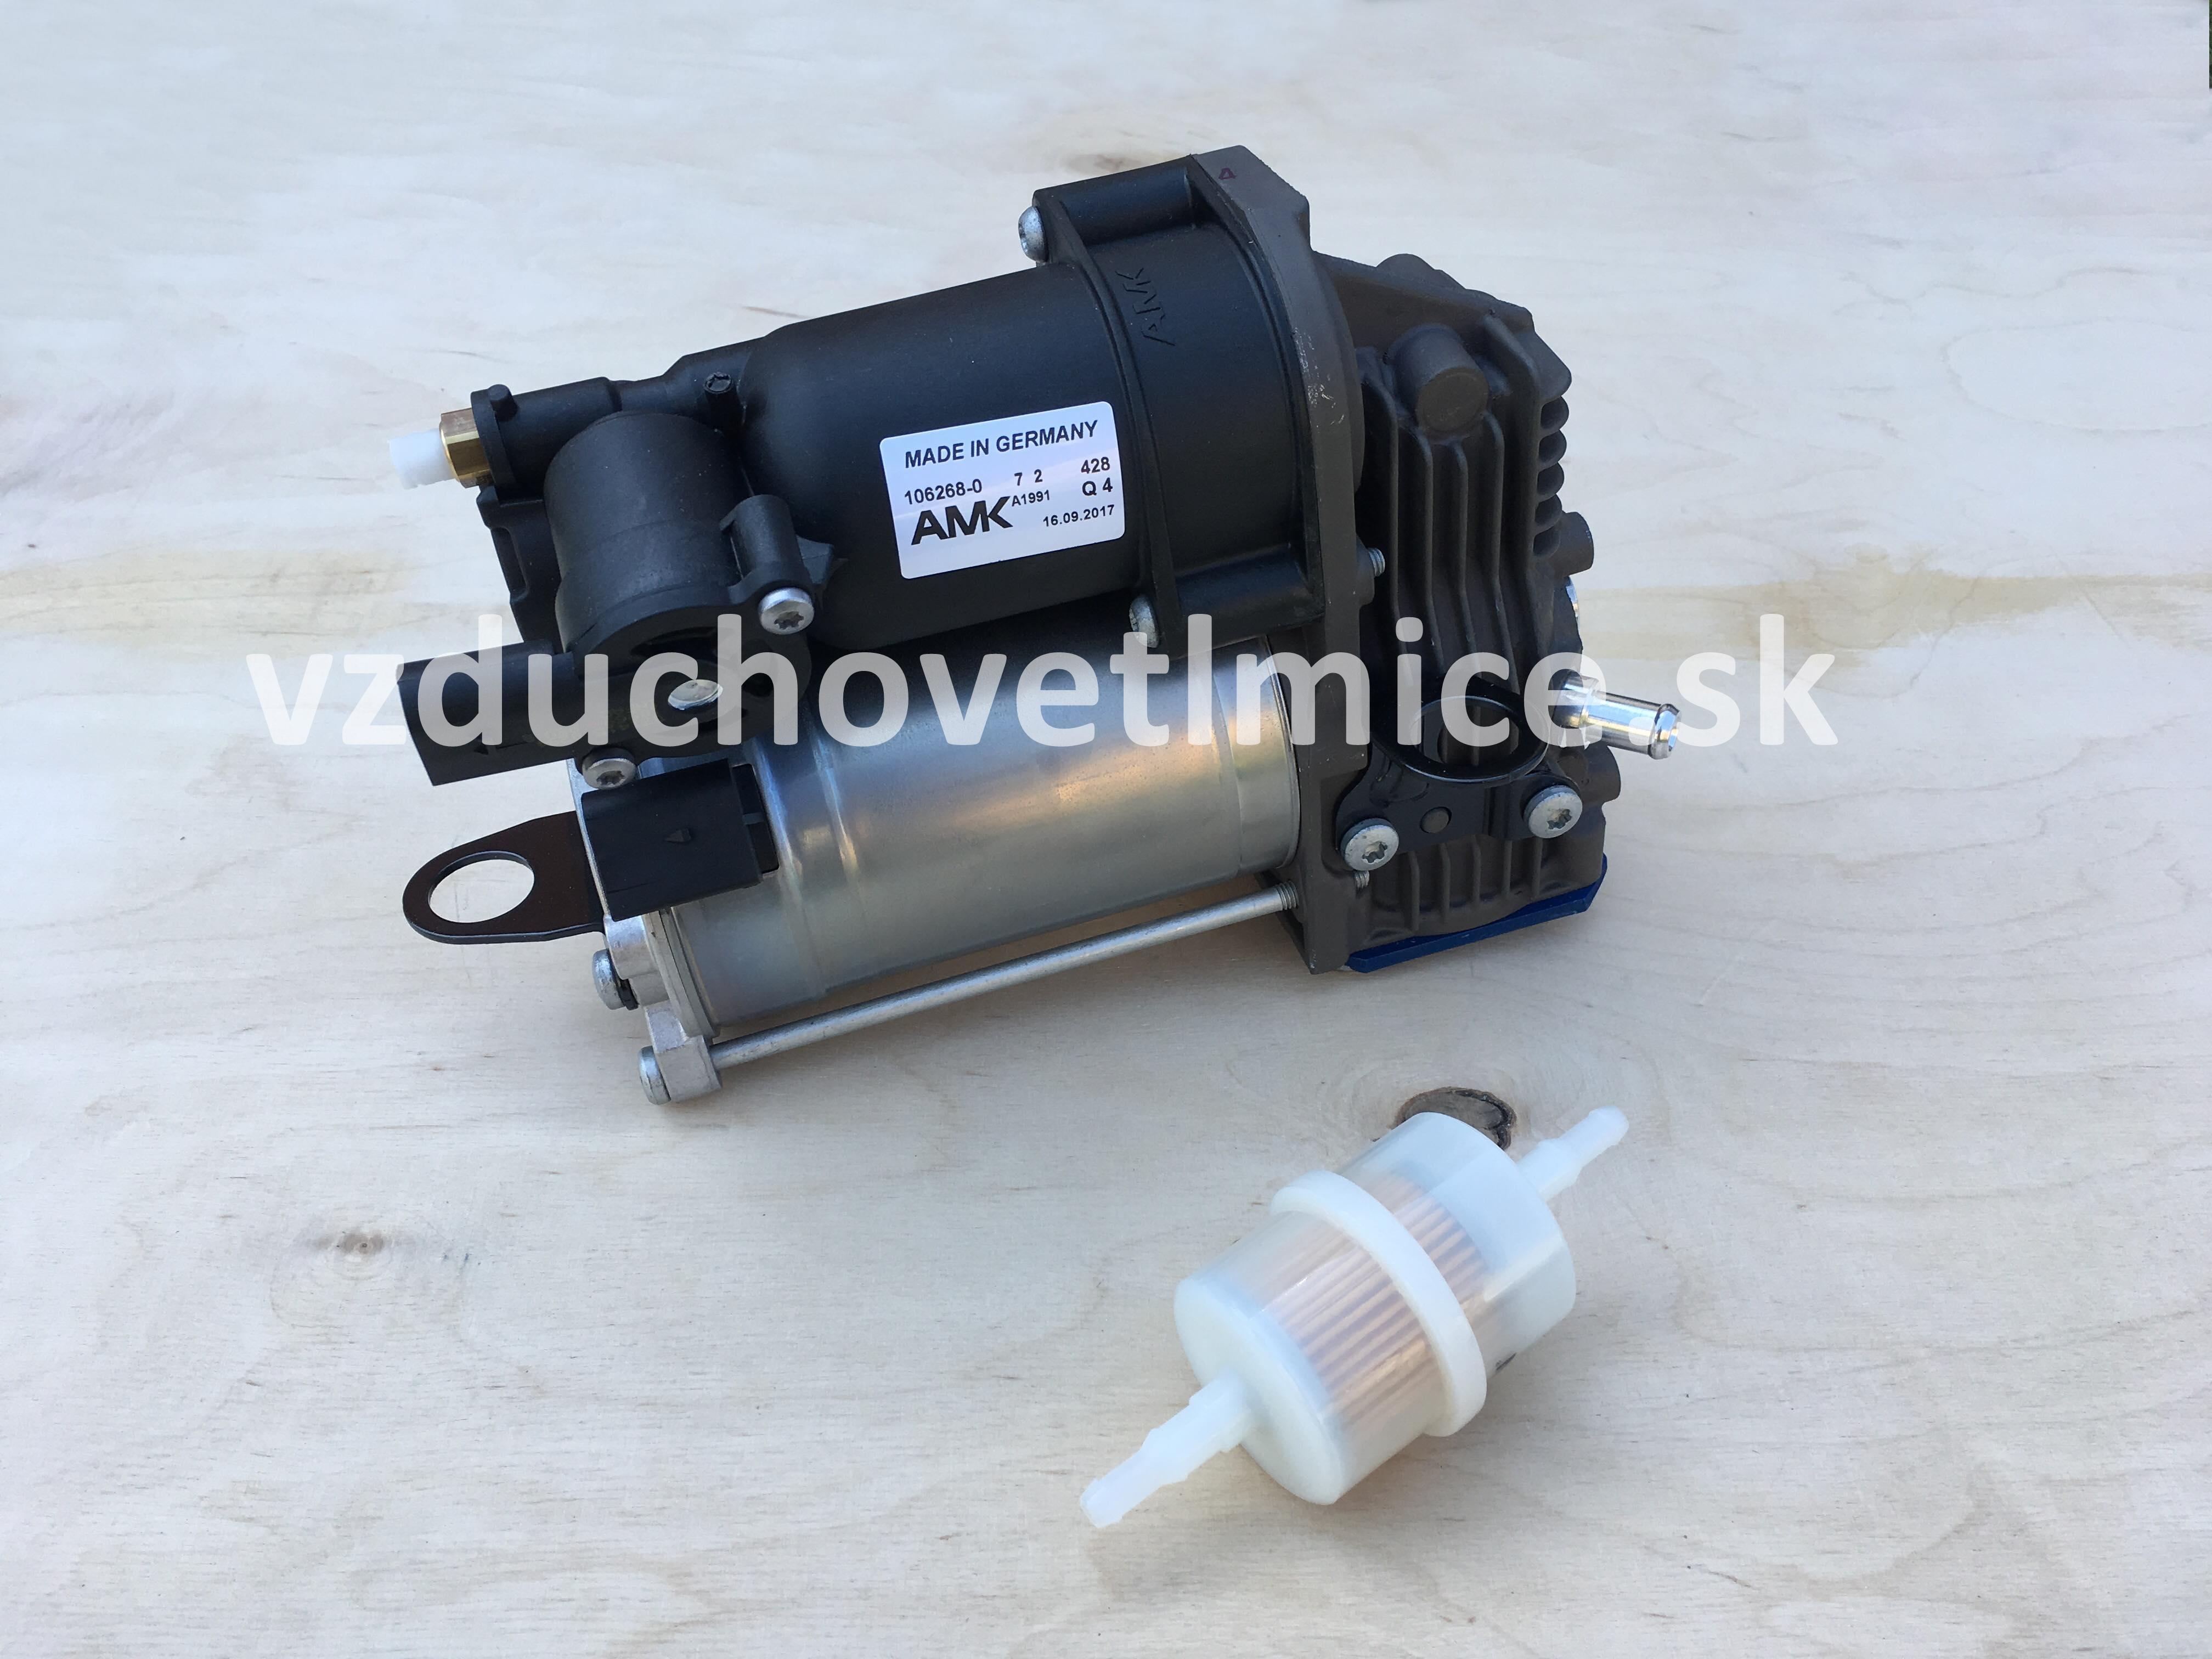 vzduchový kompresor podvozku AMK Mercedes Benz GL-class X164